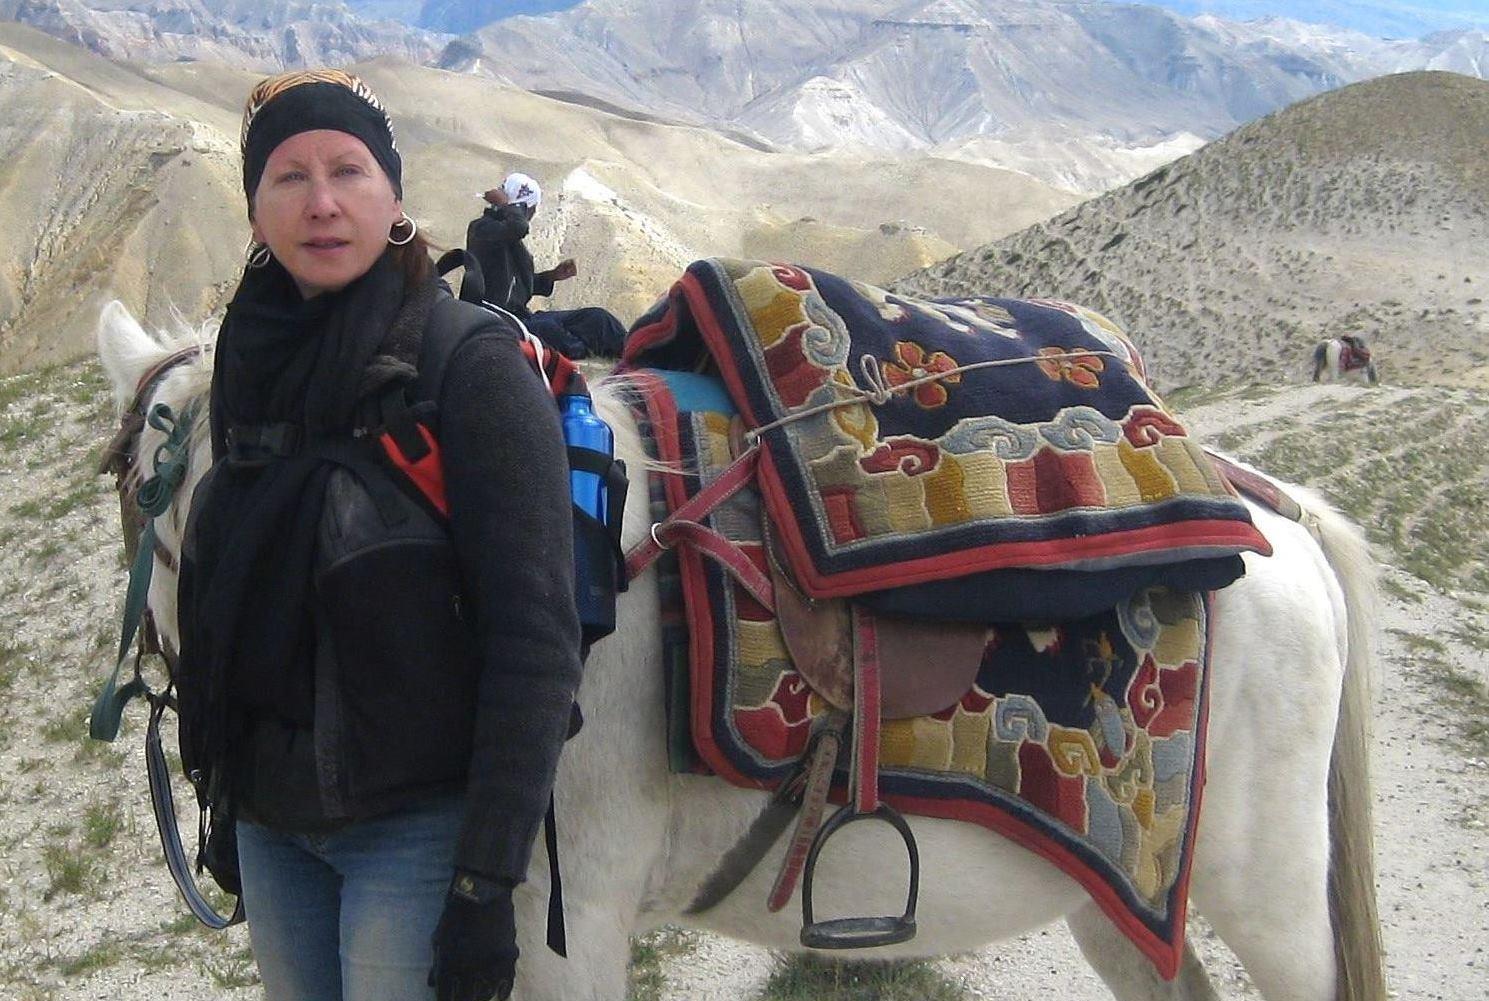 Maureen Drdak with her mare Dolma in Choser near the Tibetan border, Upper Mustang, Nepal, 2008.